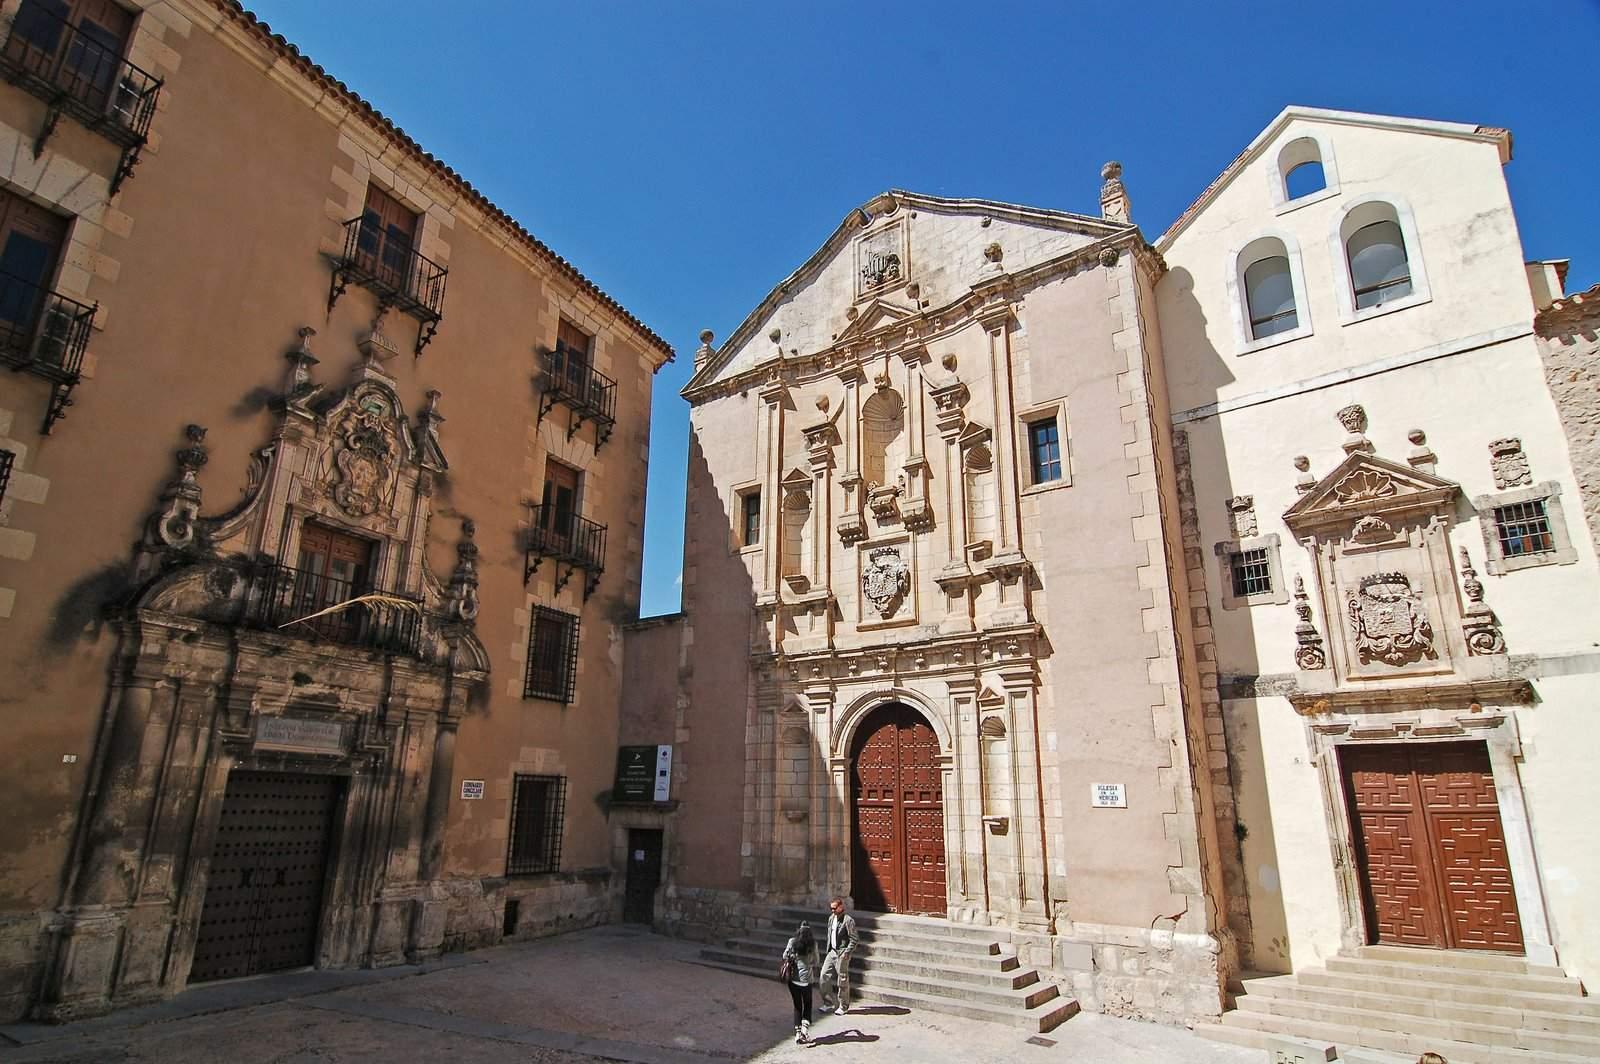 iglesia_de_la_Merced_Cuenca_Semana_musica_religiosa_mirandoacuenca.es